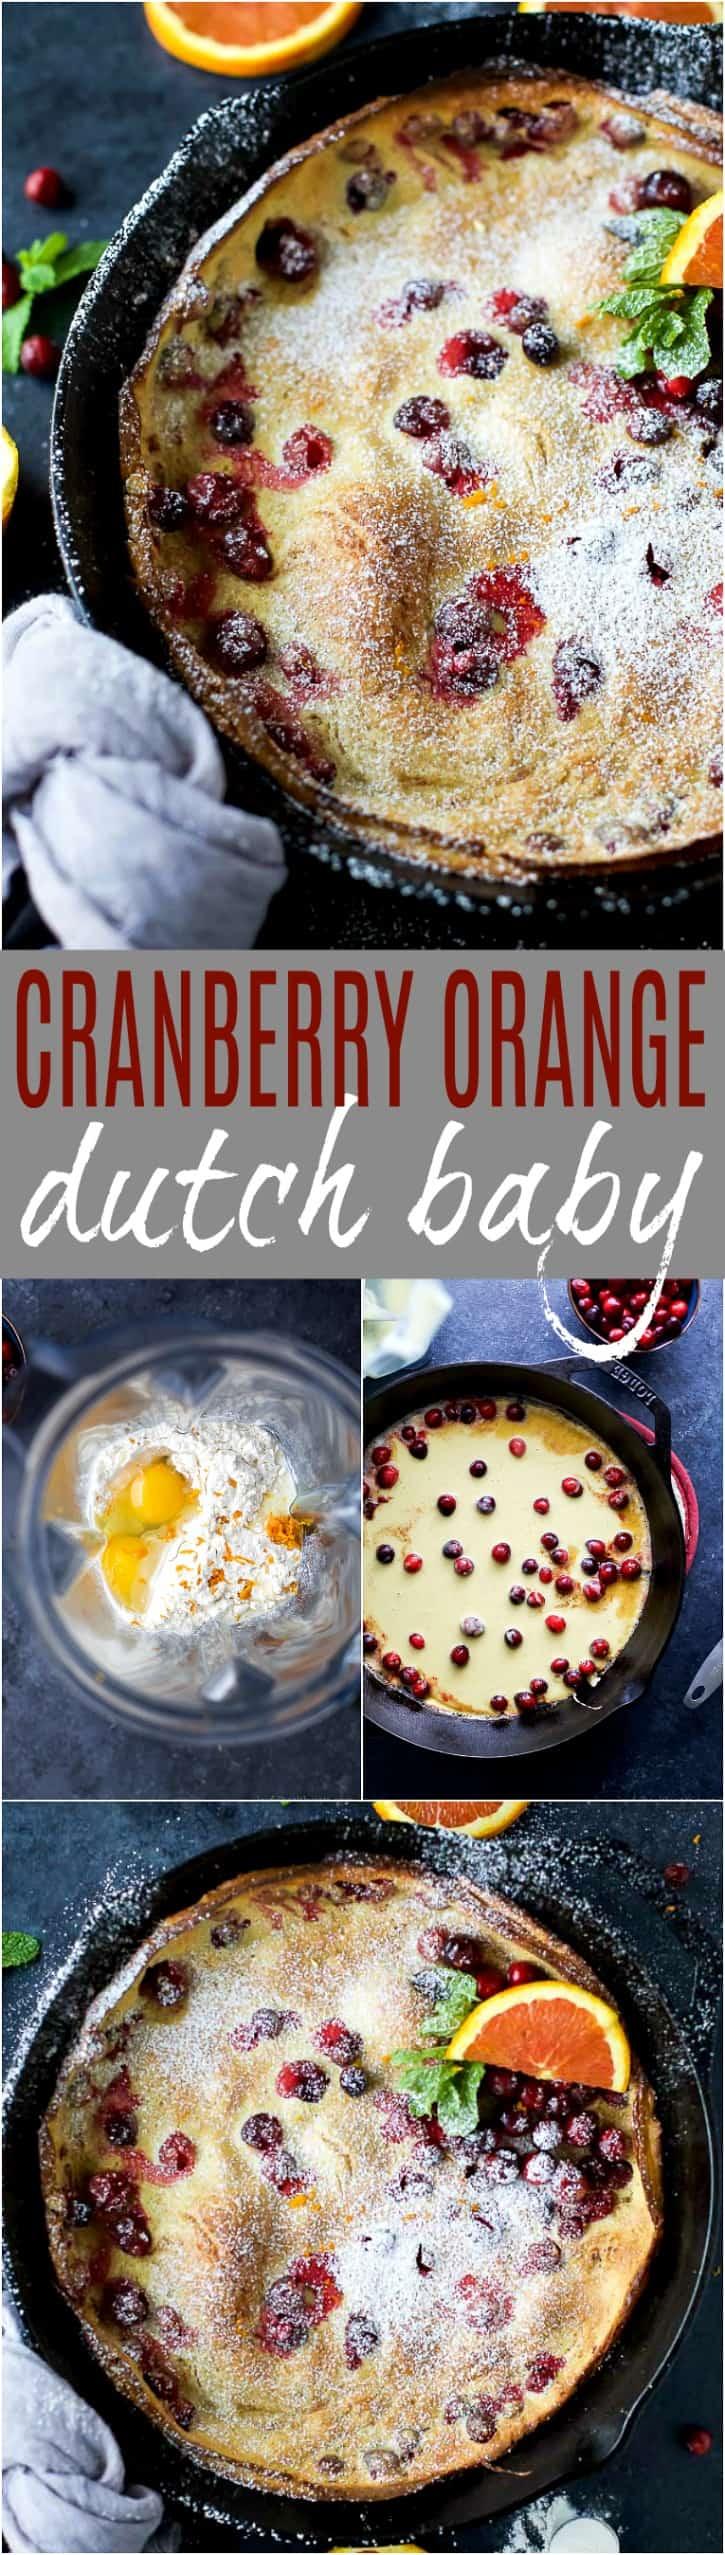 Collage for Cranberry Orange Dutch Baby recipe